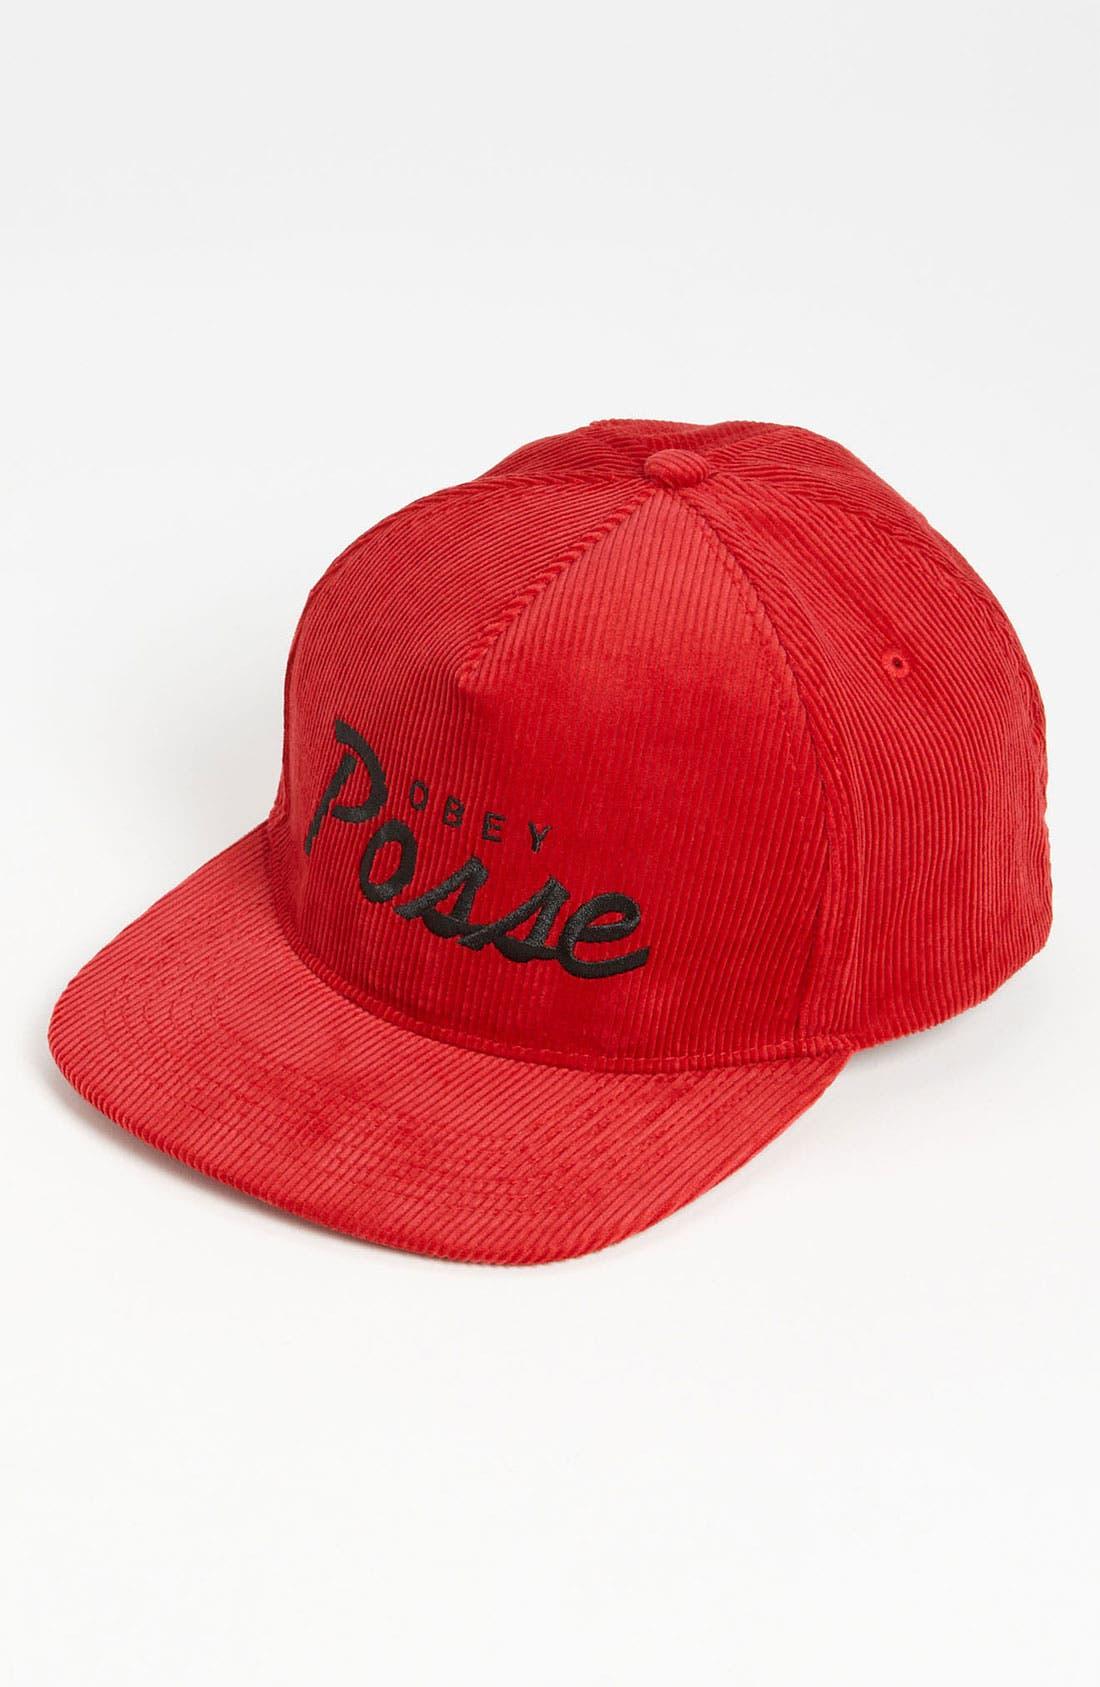 Alternate Image 1 Selected - Obey 'Postgame' Snapback Baseball Cap